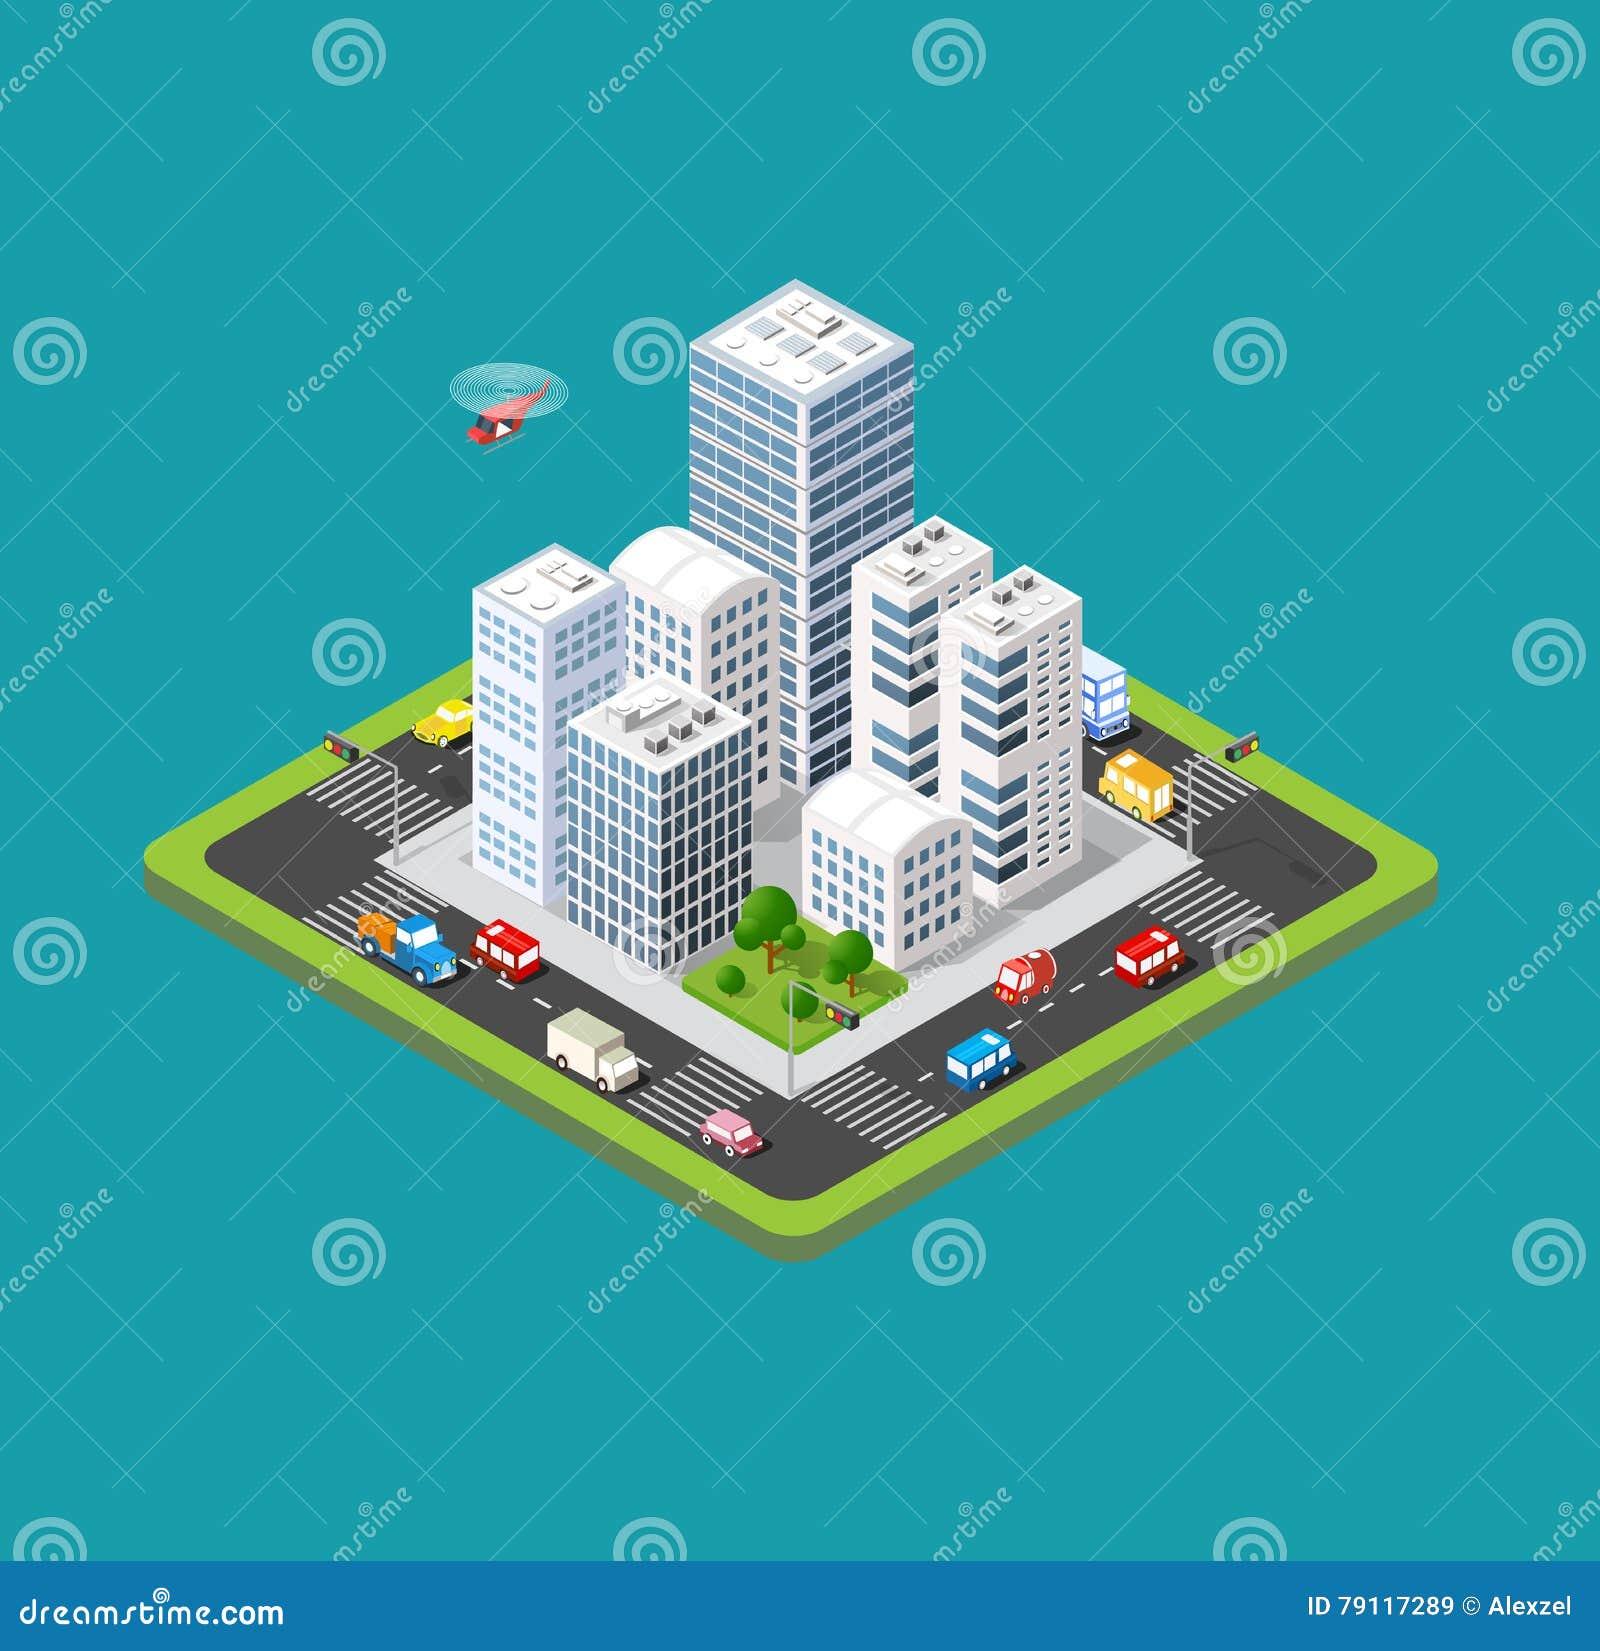 Ciudad urbana isométrica